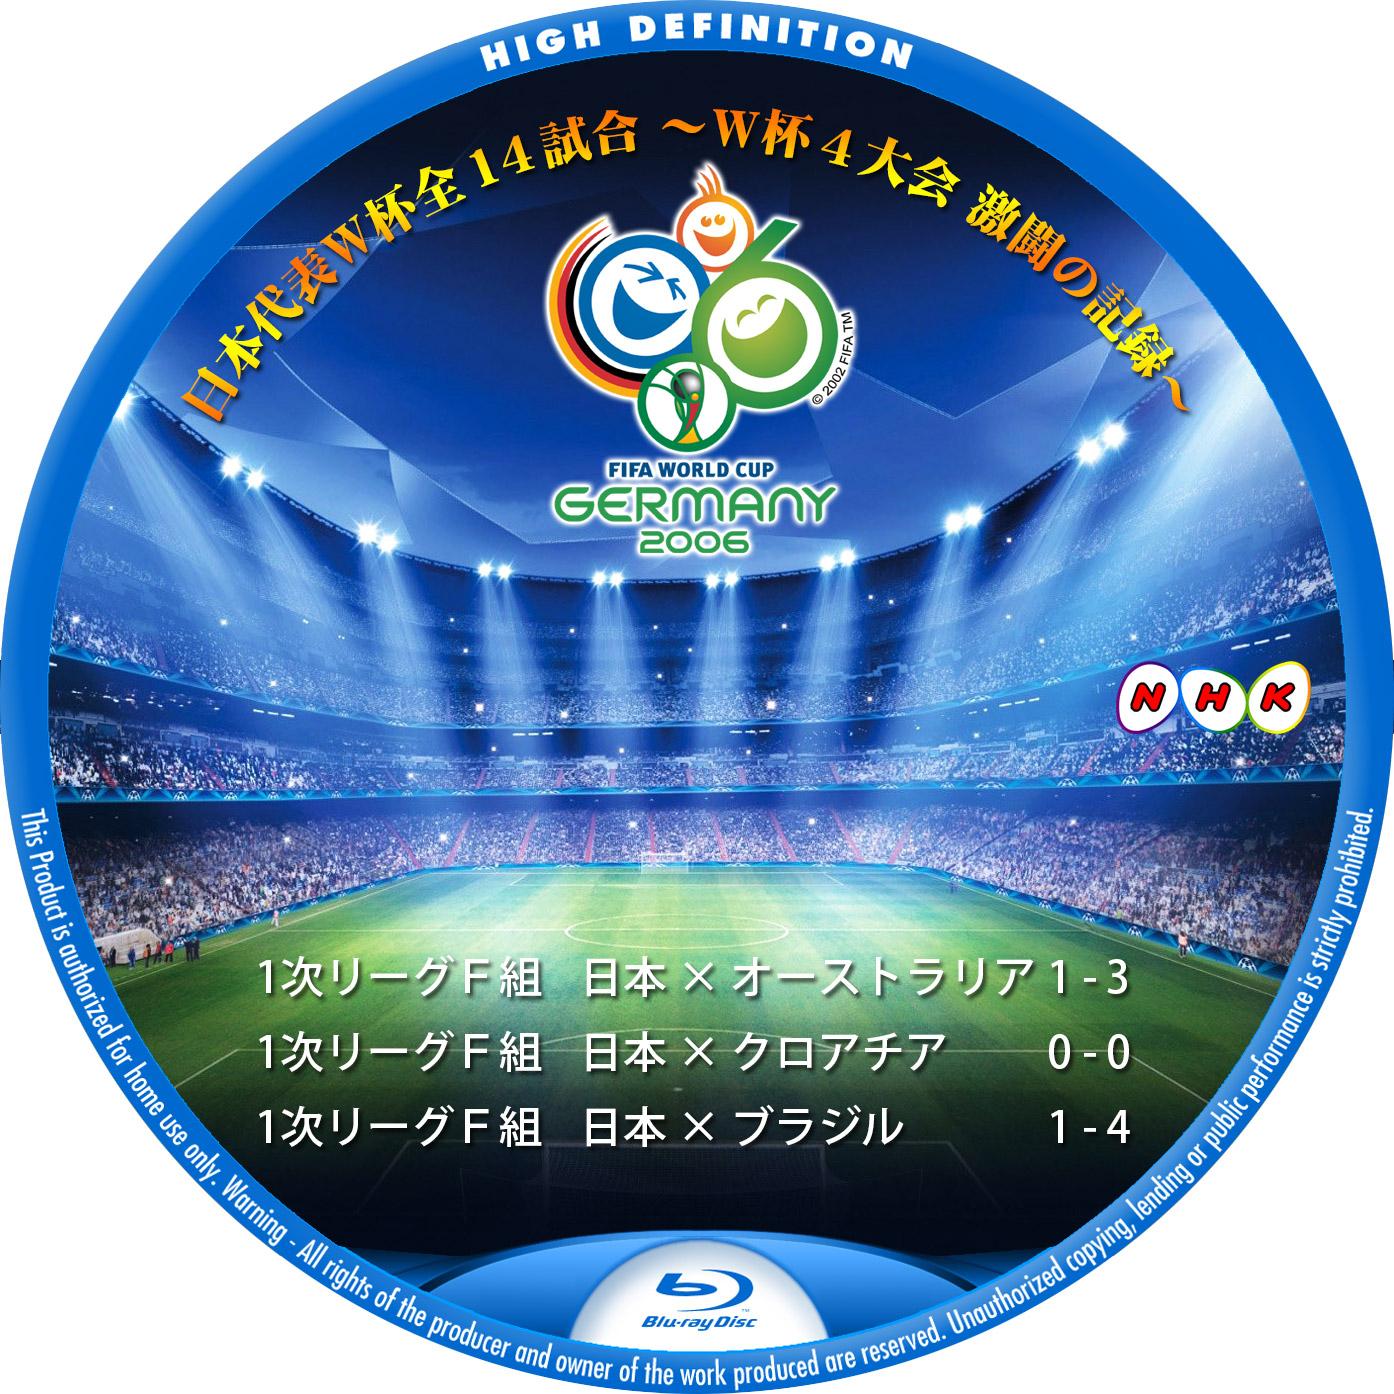 World Cup 2006 日本代表 ラベル